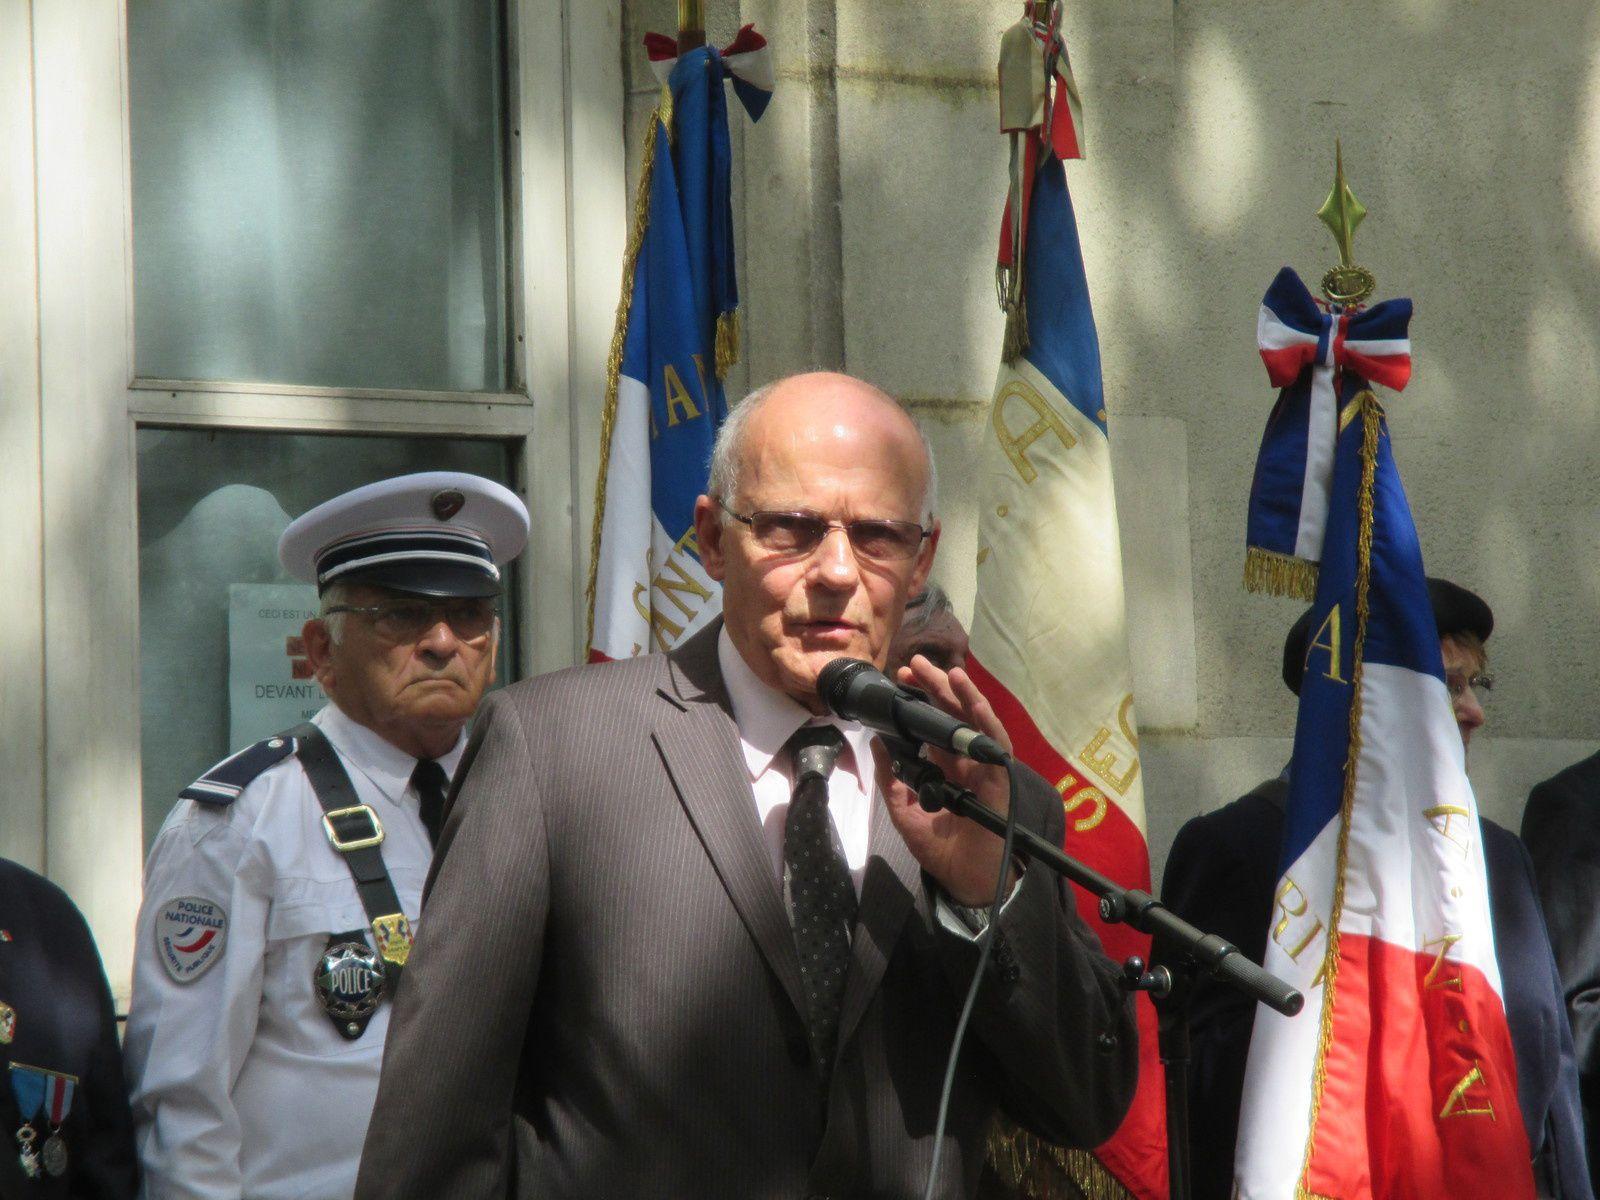 Maurice ODIARD Président de l'UFAC Rhône